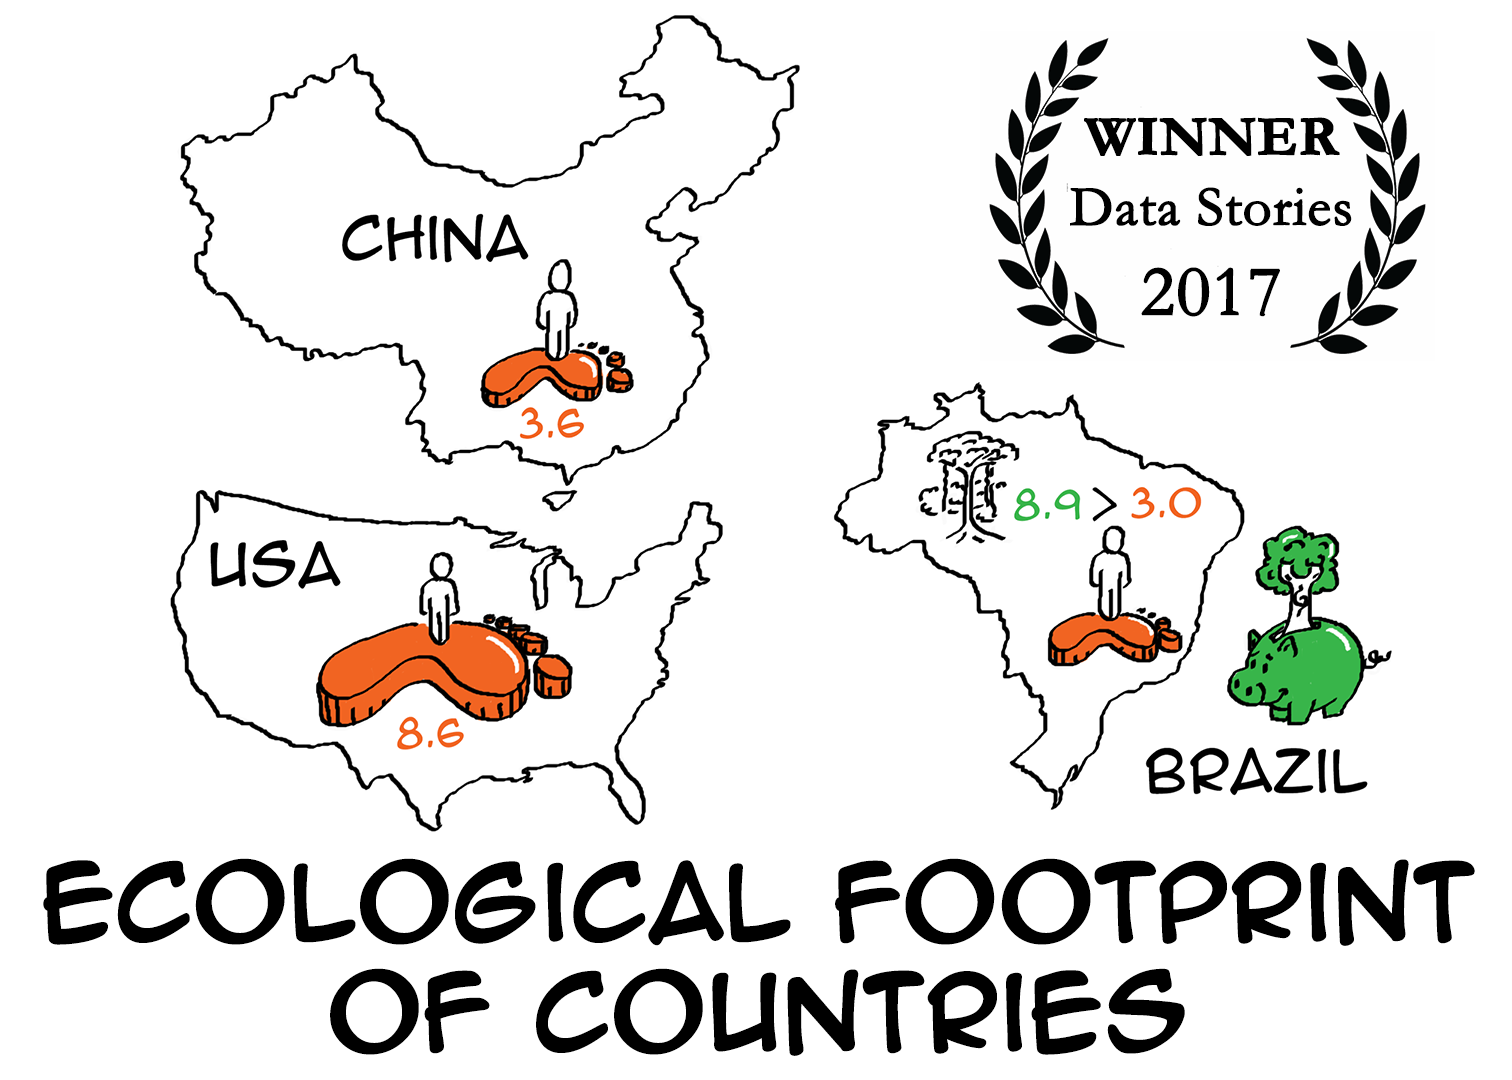 Ecological Footprint of Countries (2017 Data Stories Winner)